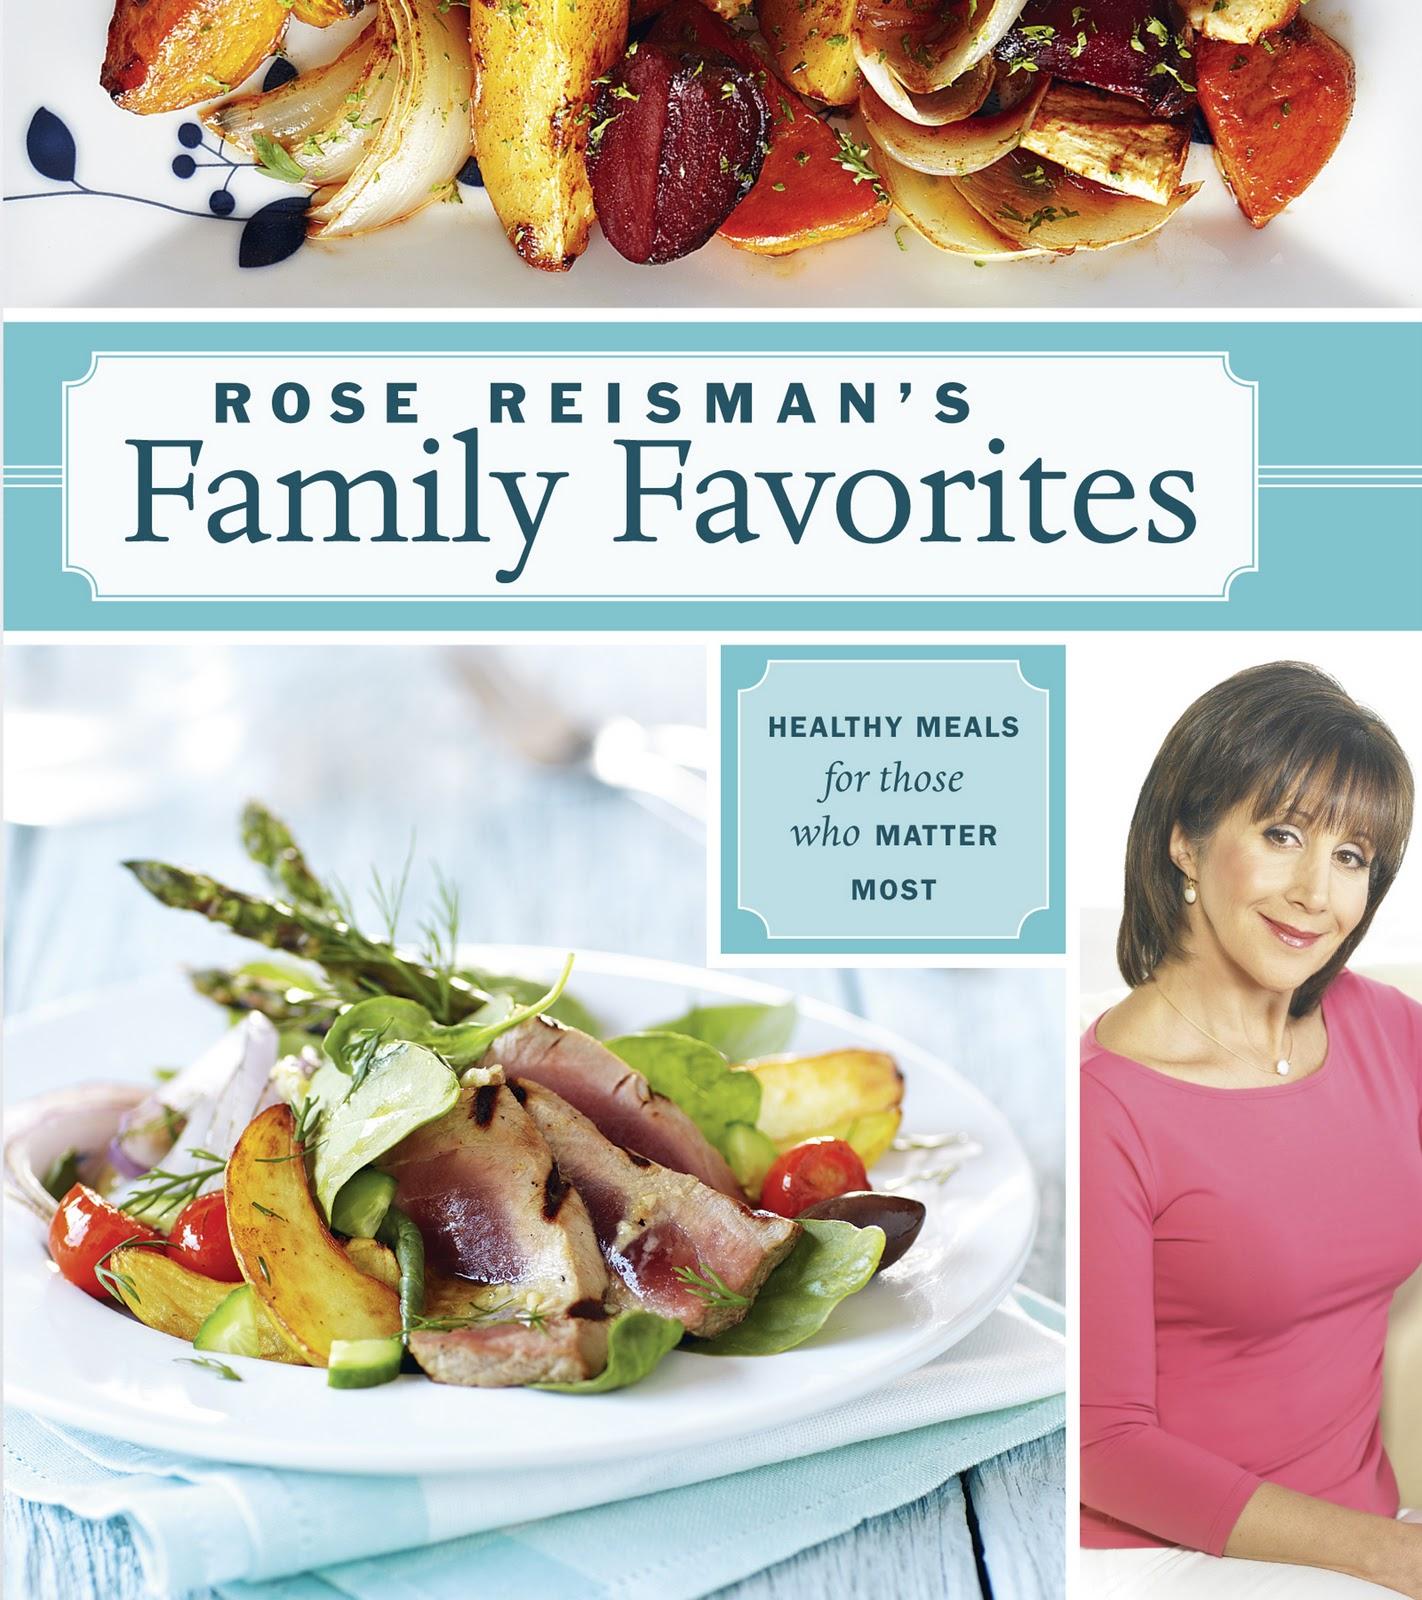 Rose Reisman\'s Family Favorites Cookbook Review - My Cookbook Addiction